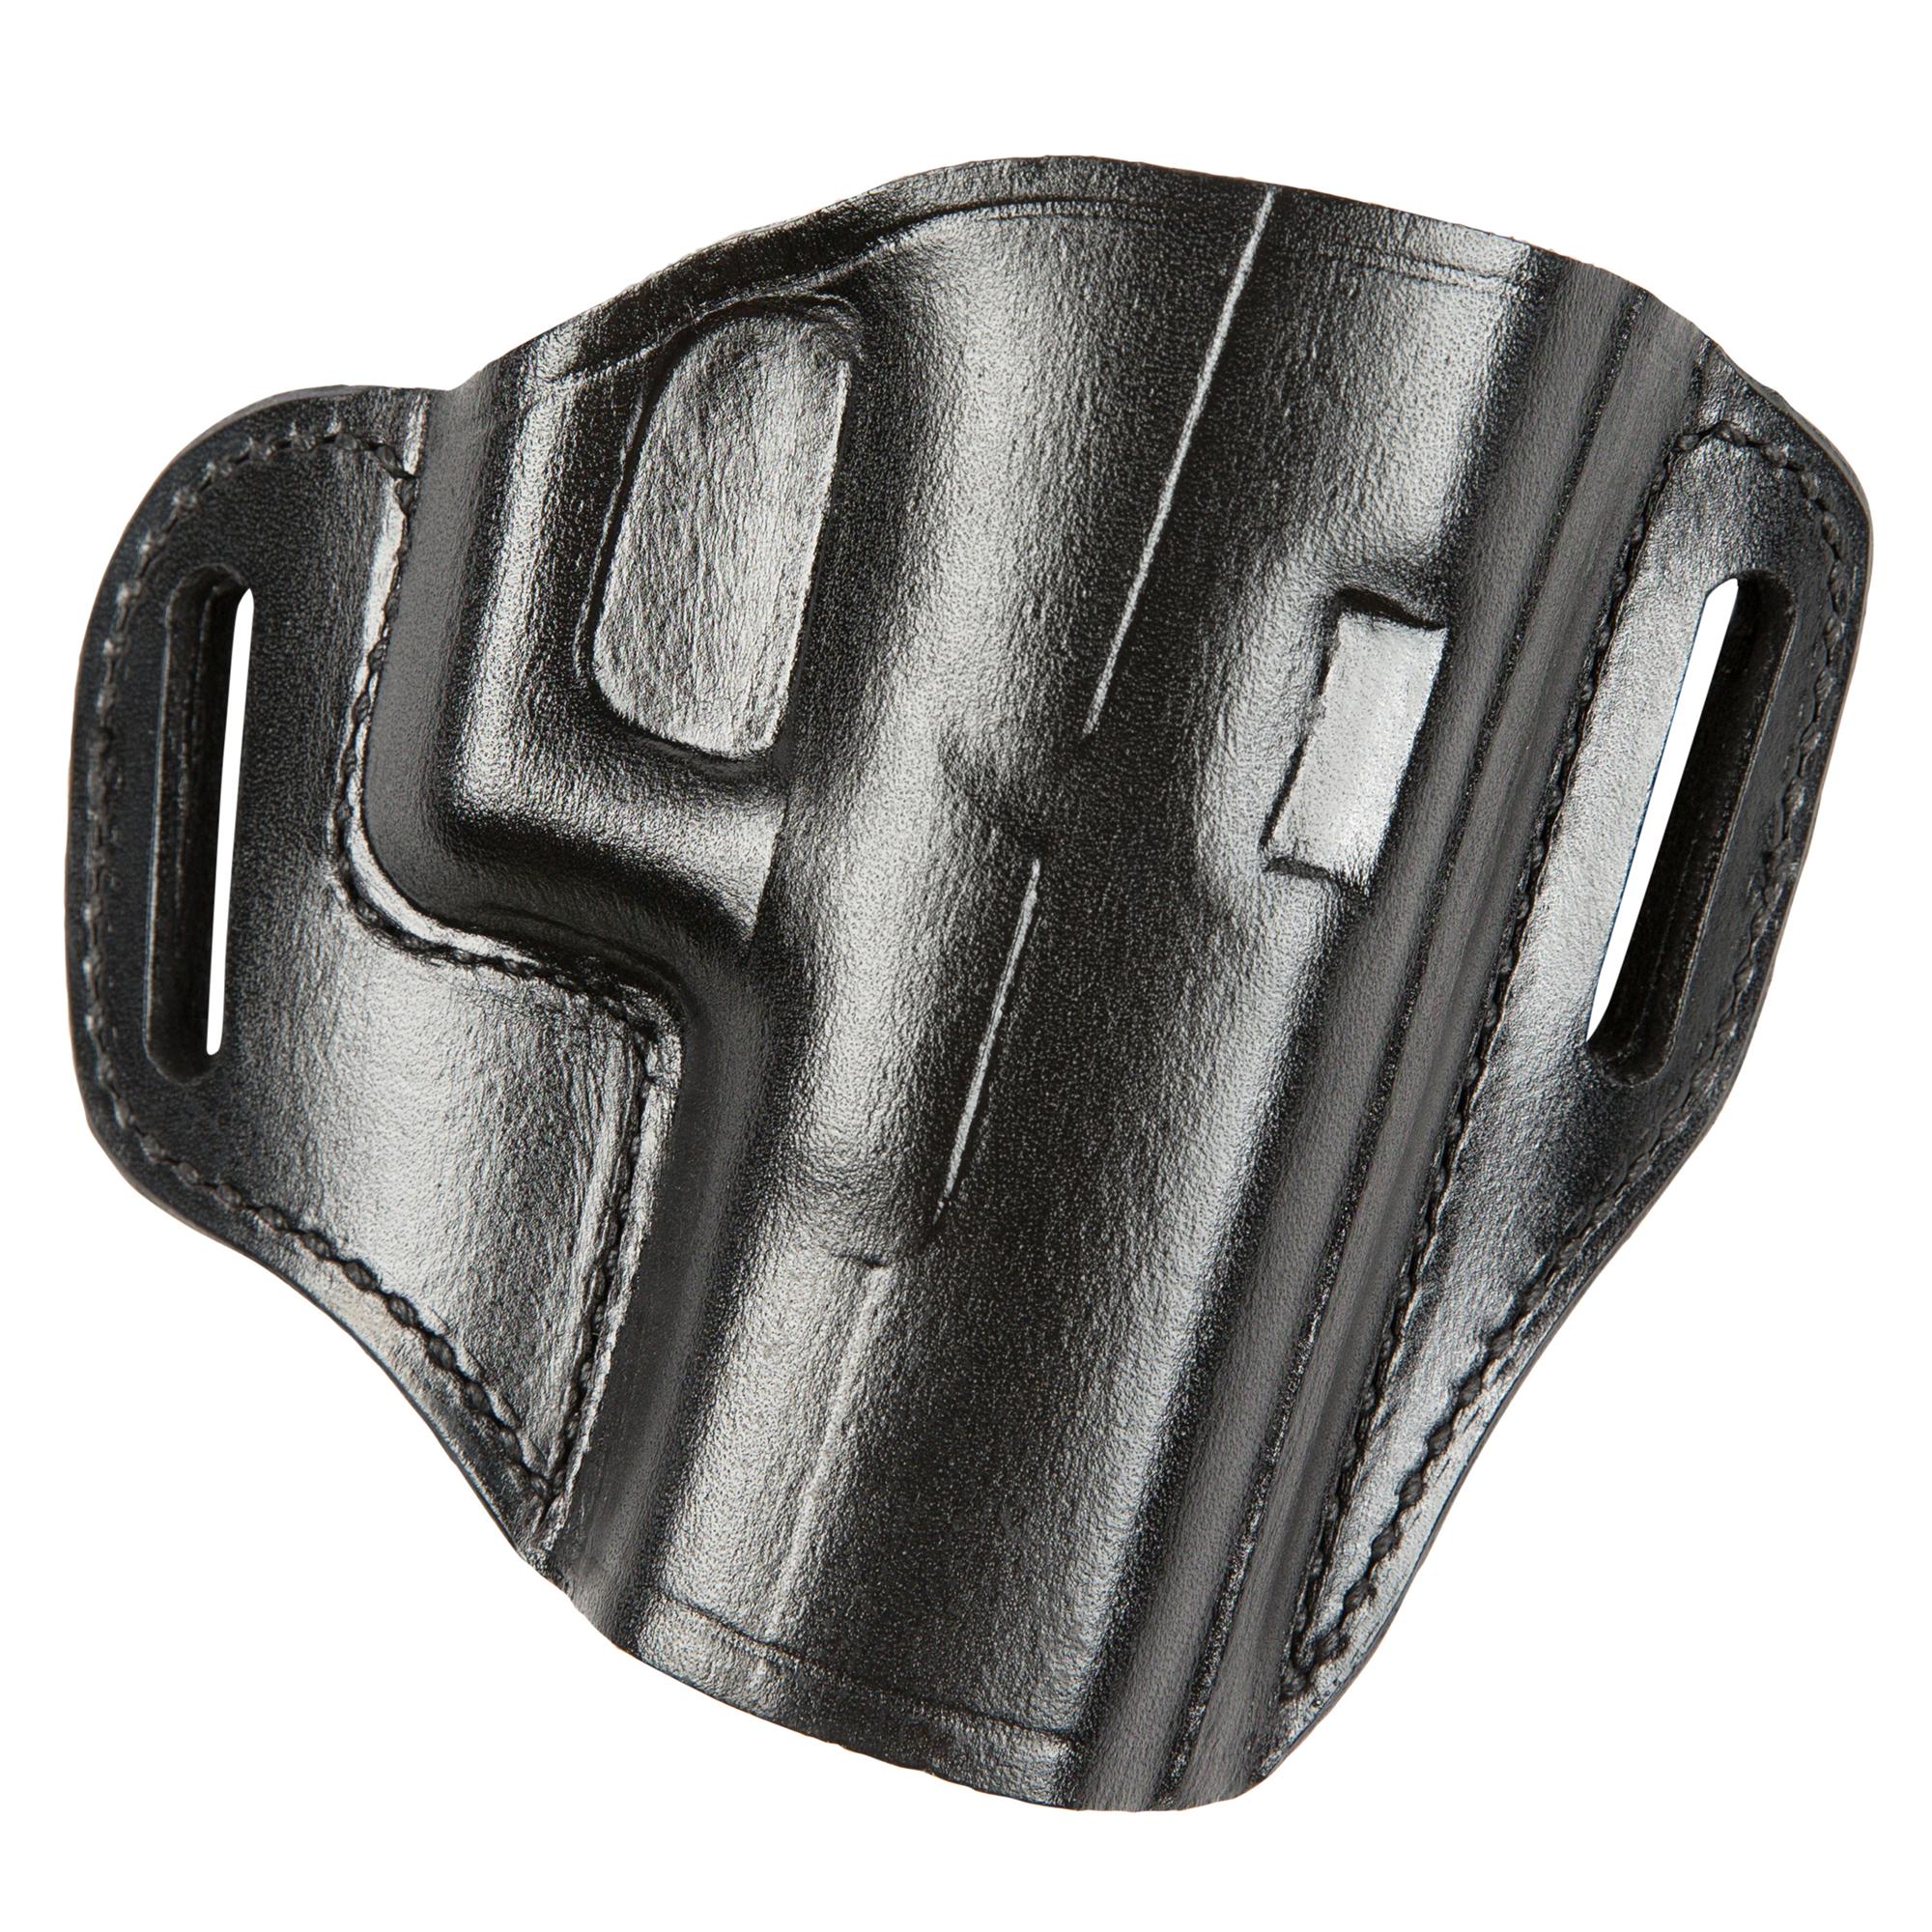 Bianchi Model 57 Remedy Belt Slide Holster, S & W M & P Shield